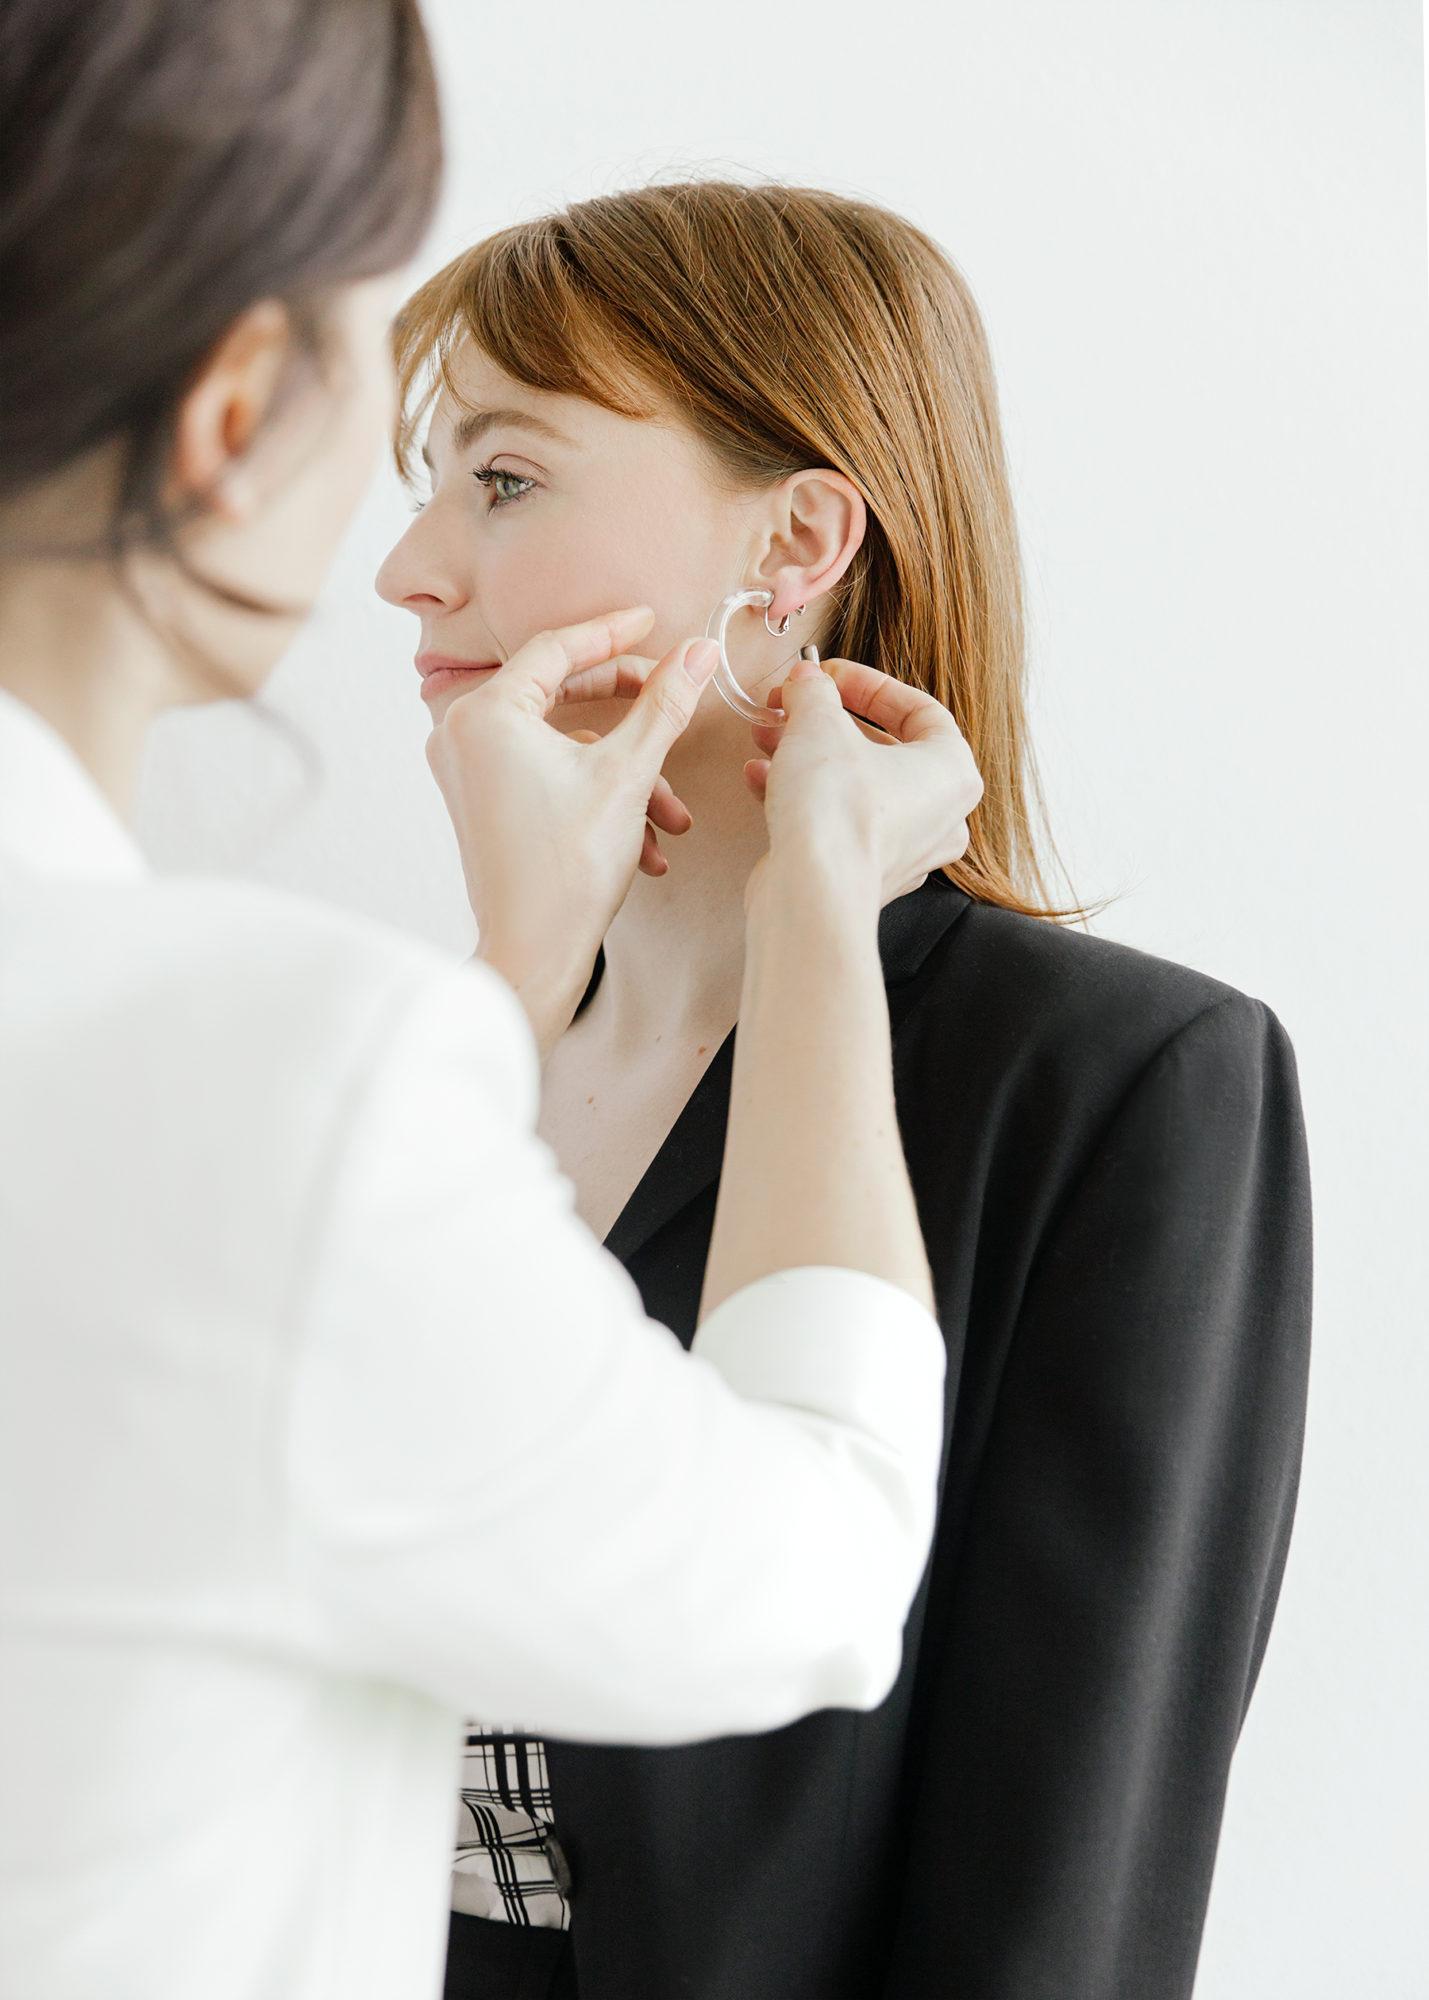 Personal stylist Seattle   style consultant   Anne Townsend   Annie Abbott